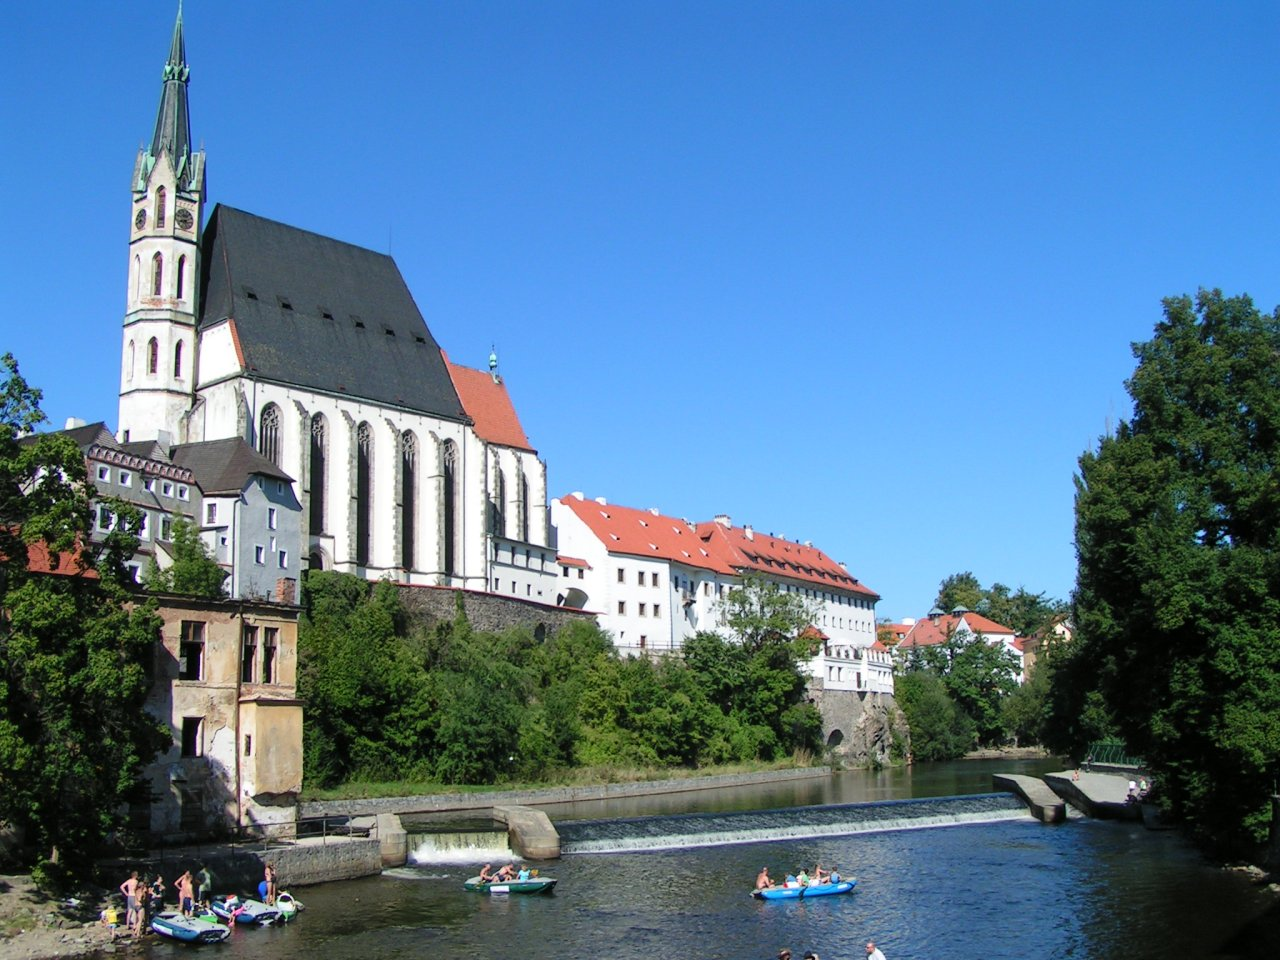 The Church of St. Vitus, Cesky Krumlov, Czech Republic